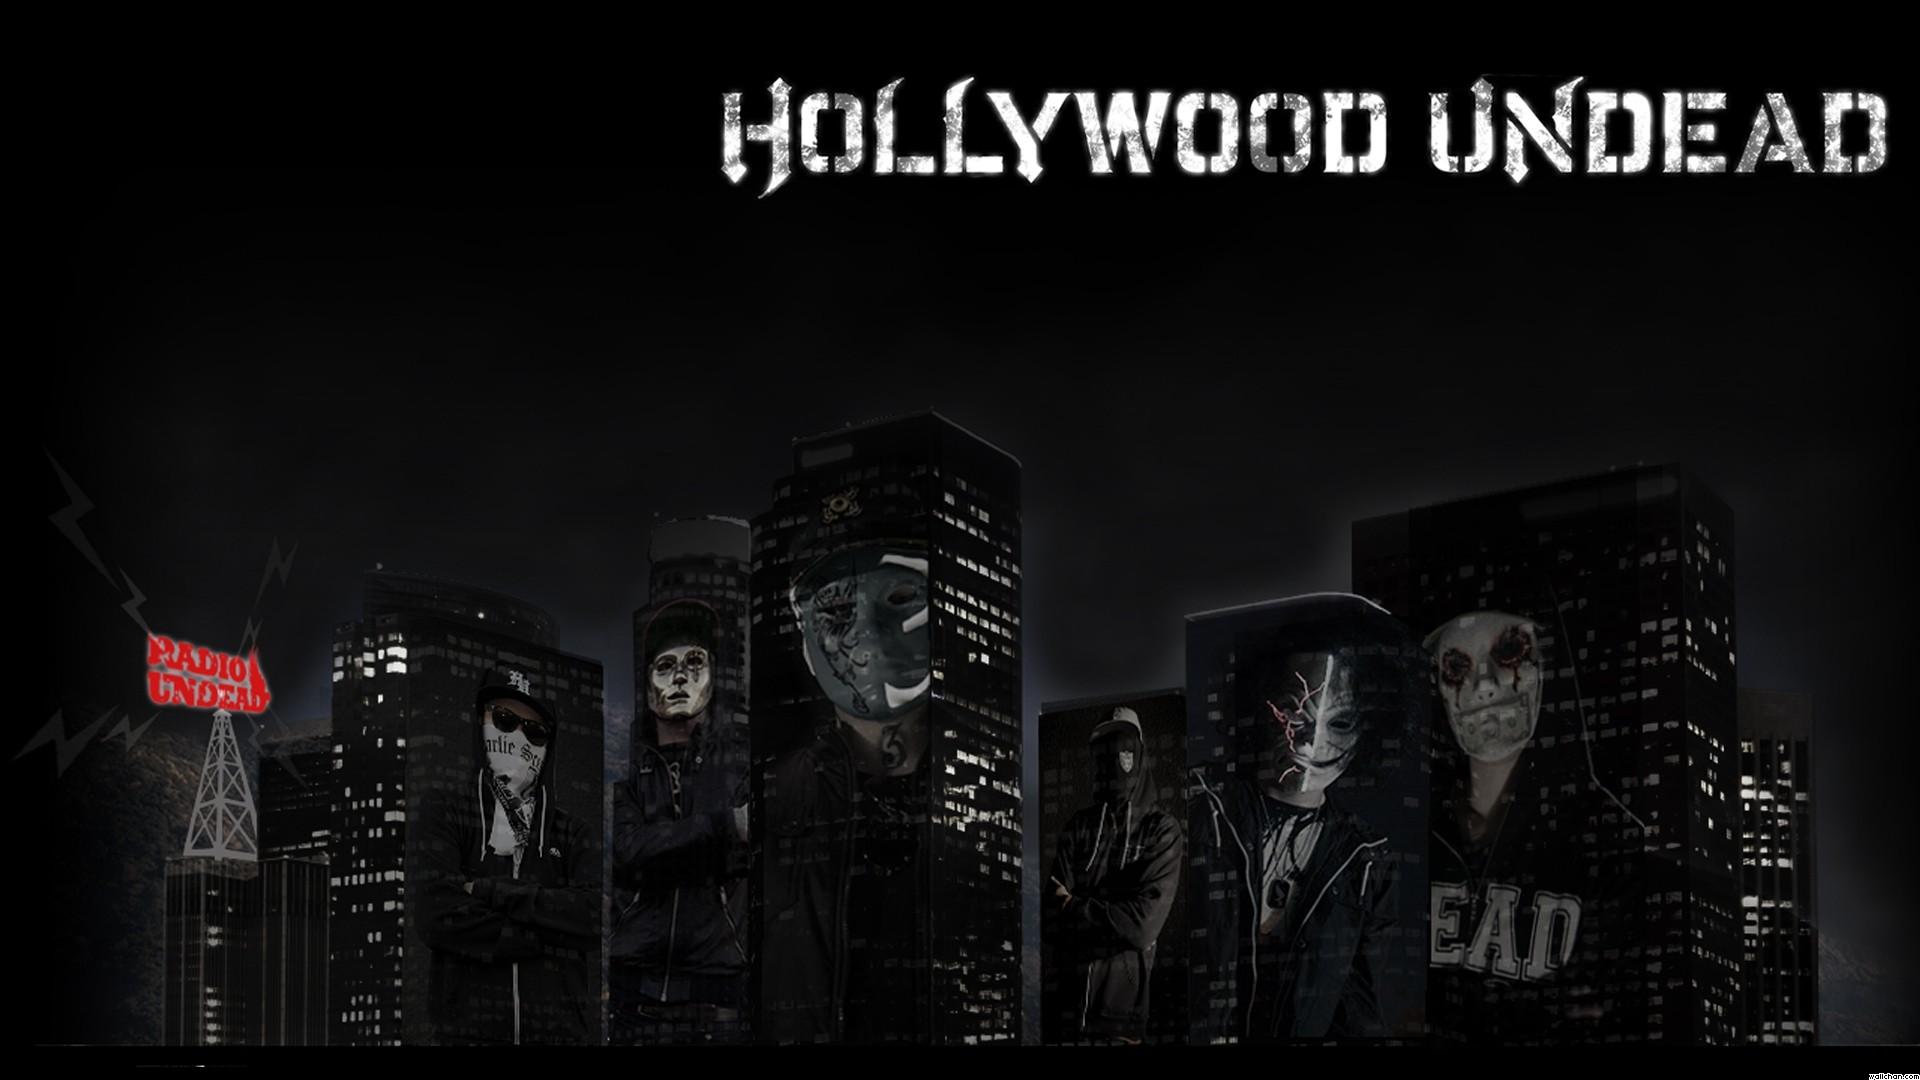 Hollywood Undead Logo Mask Rock masks wallpaper 1920x1080